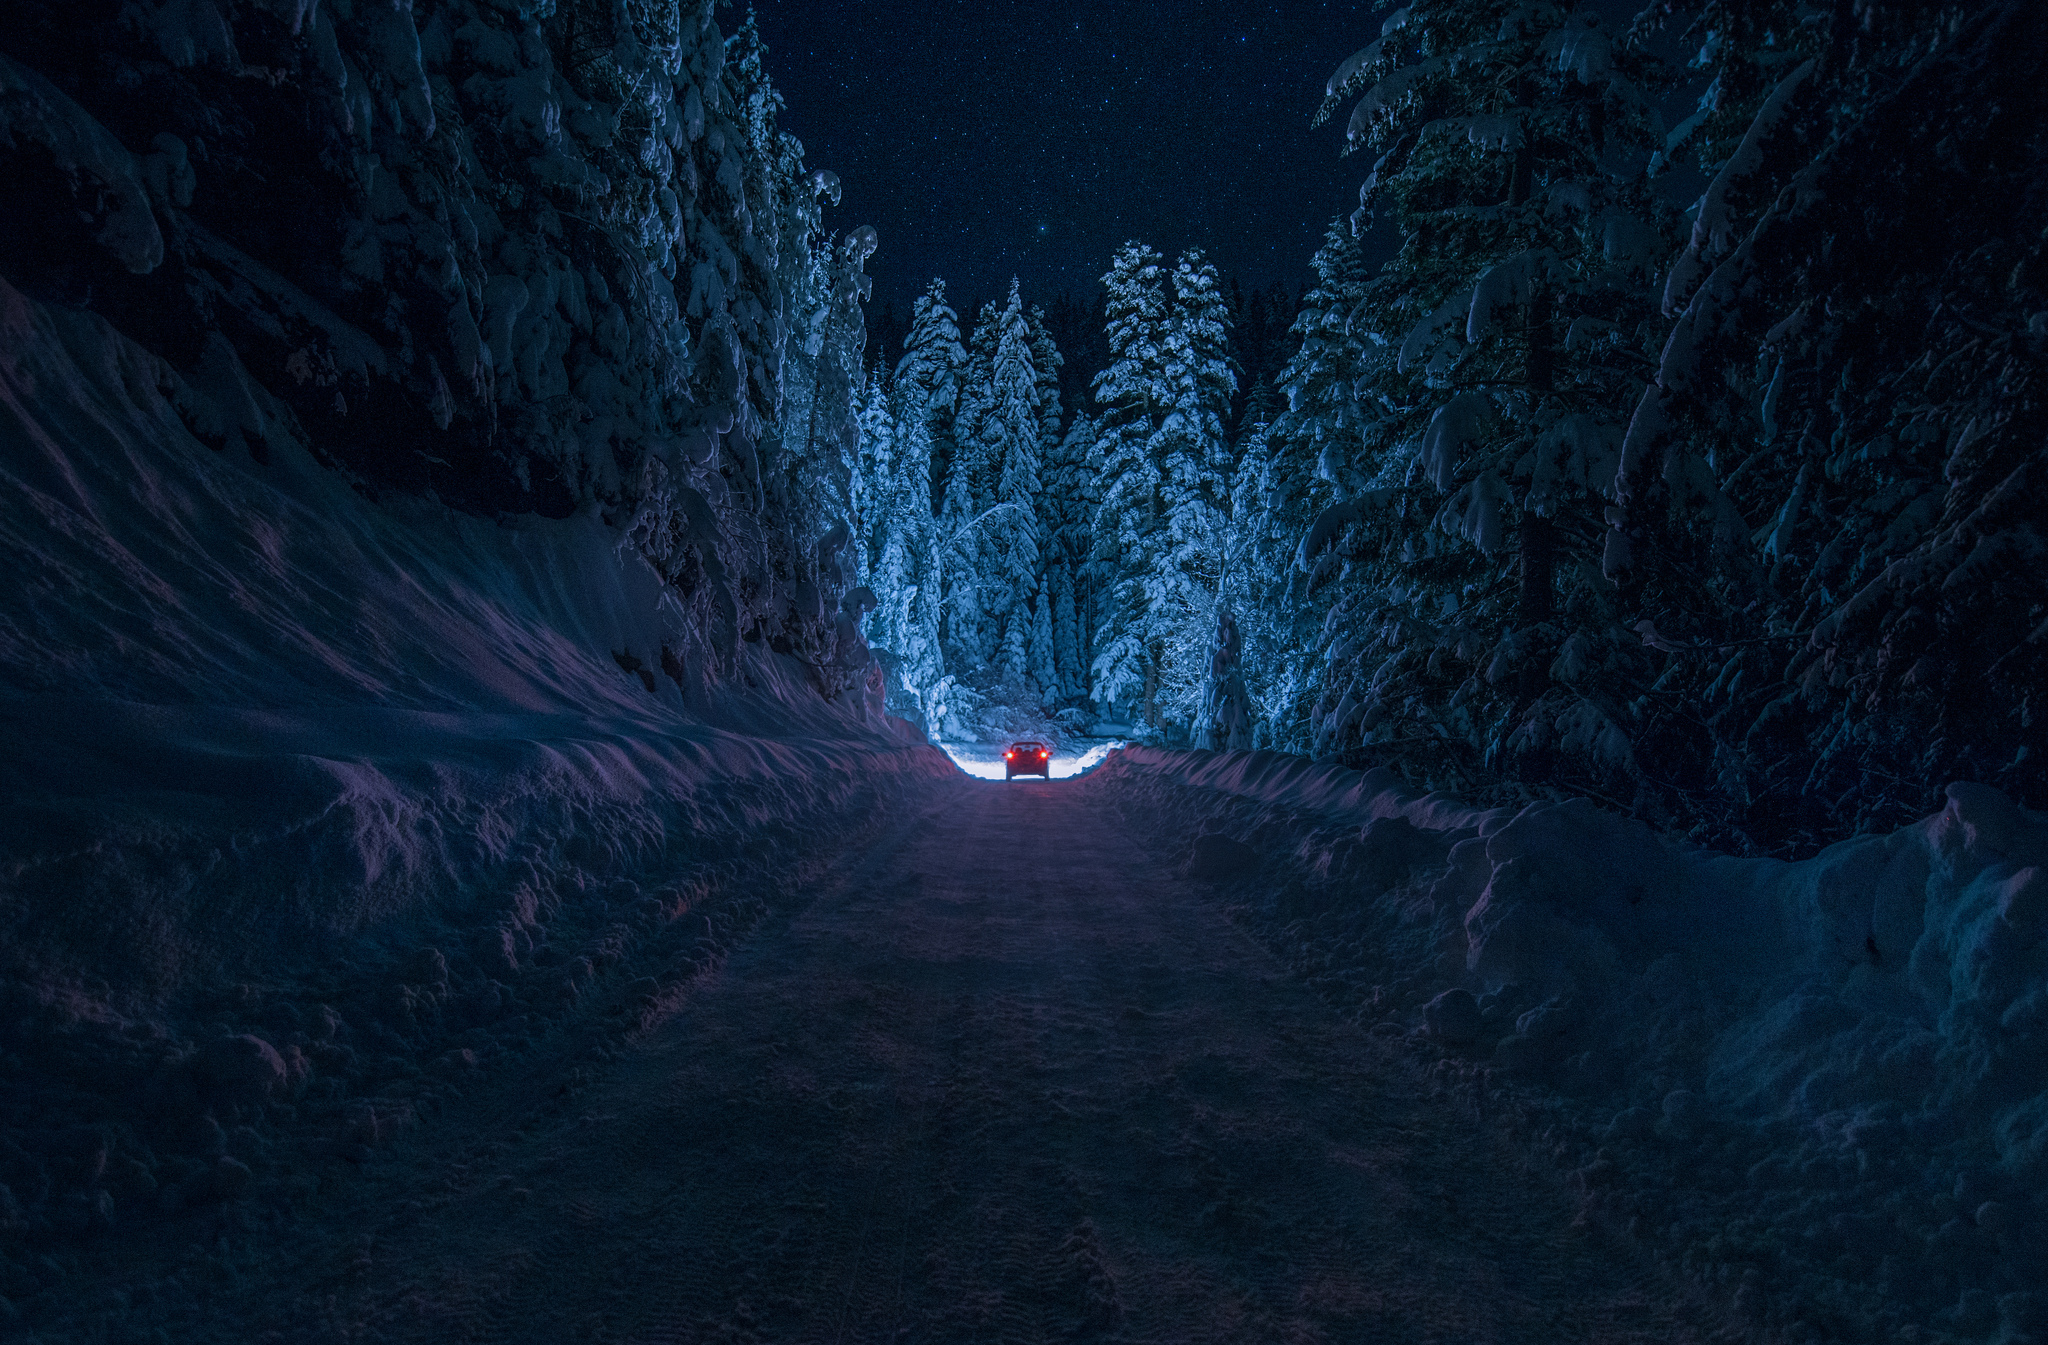 Snowy Night Forest Desktop Background Wallpaper 2048x1345